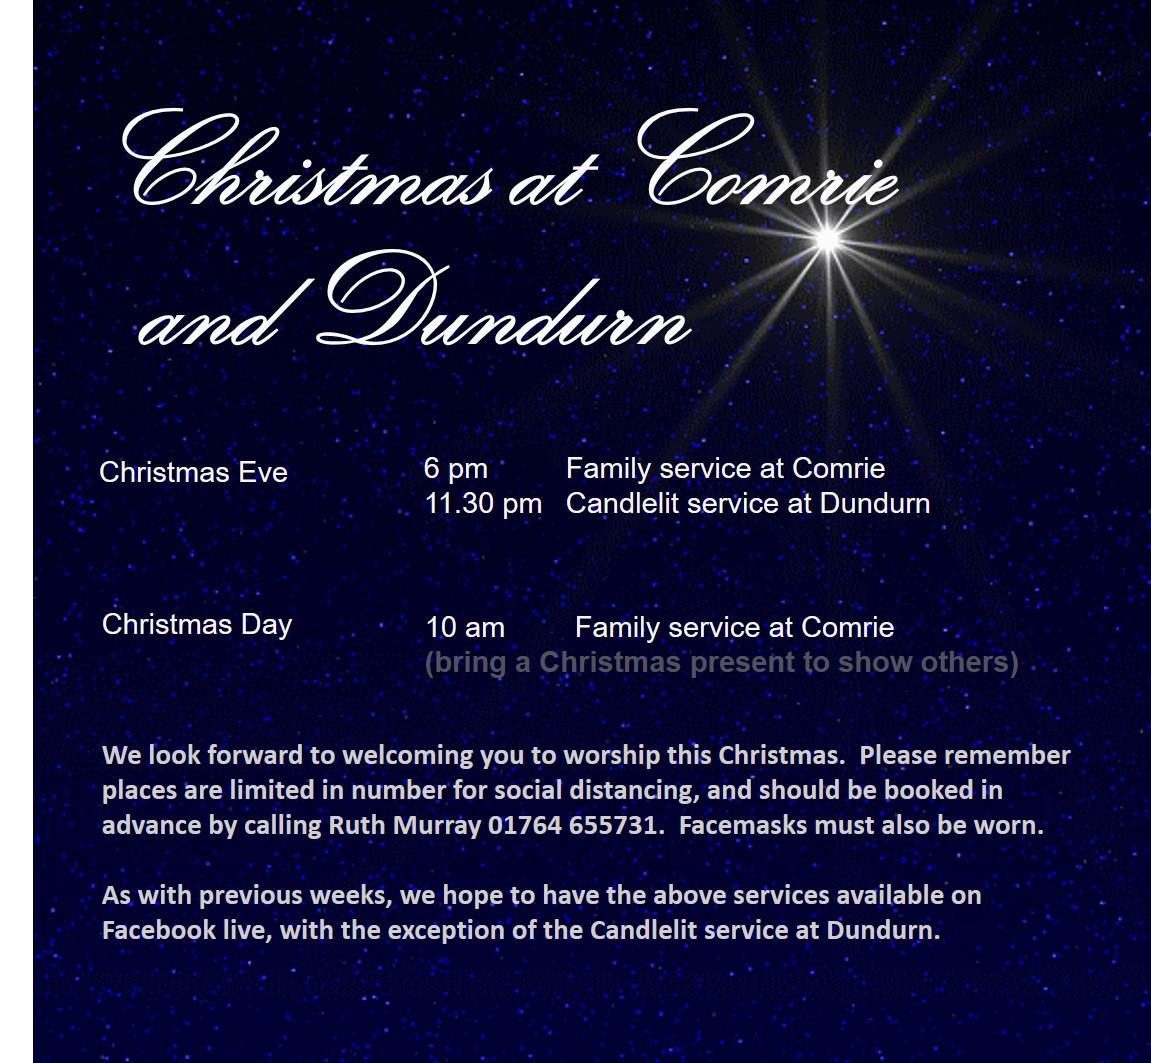 Christmas at Comrie and Dundurn